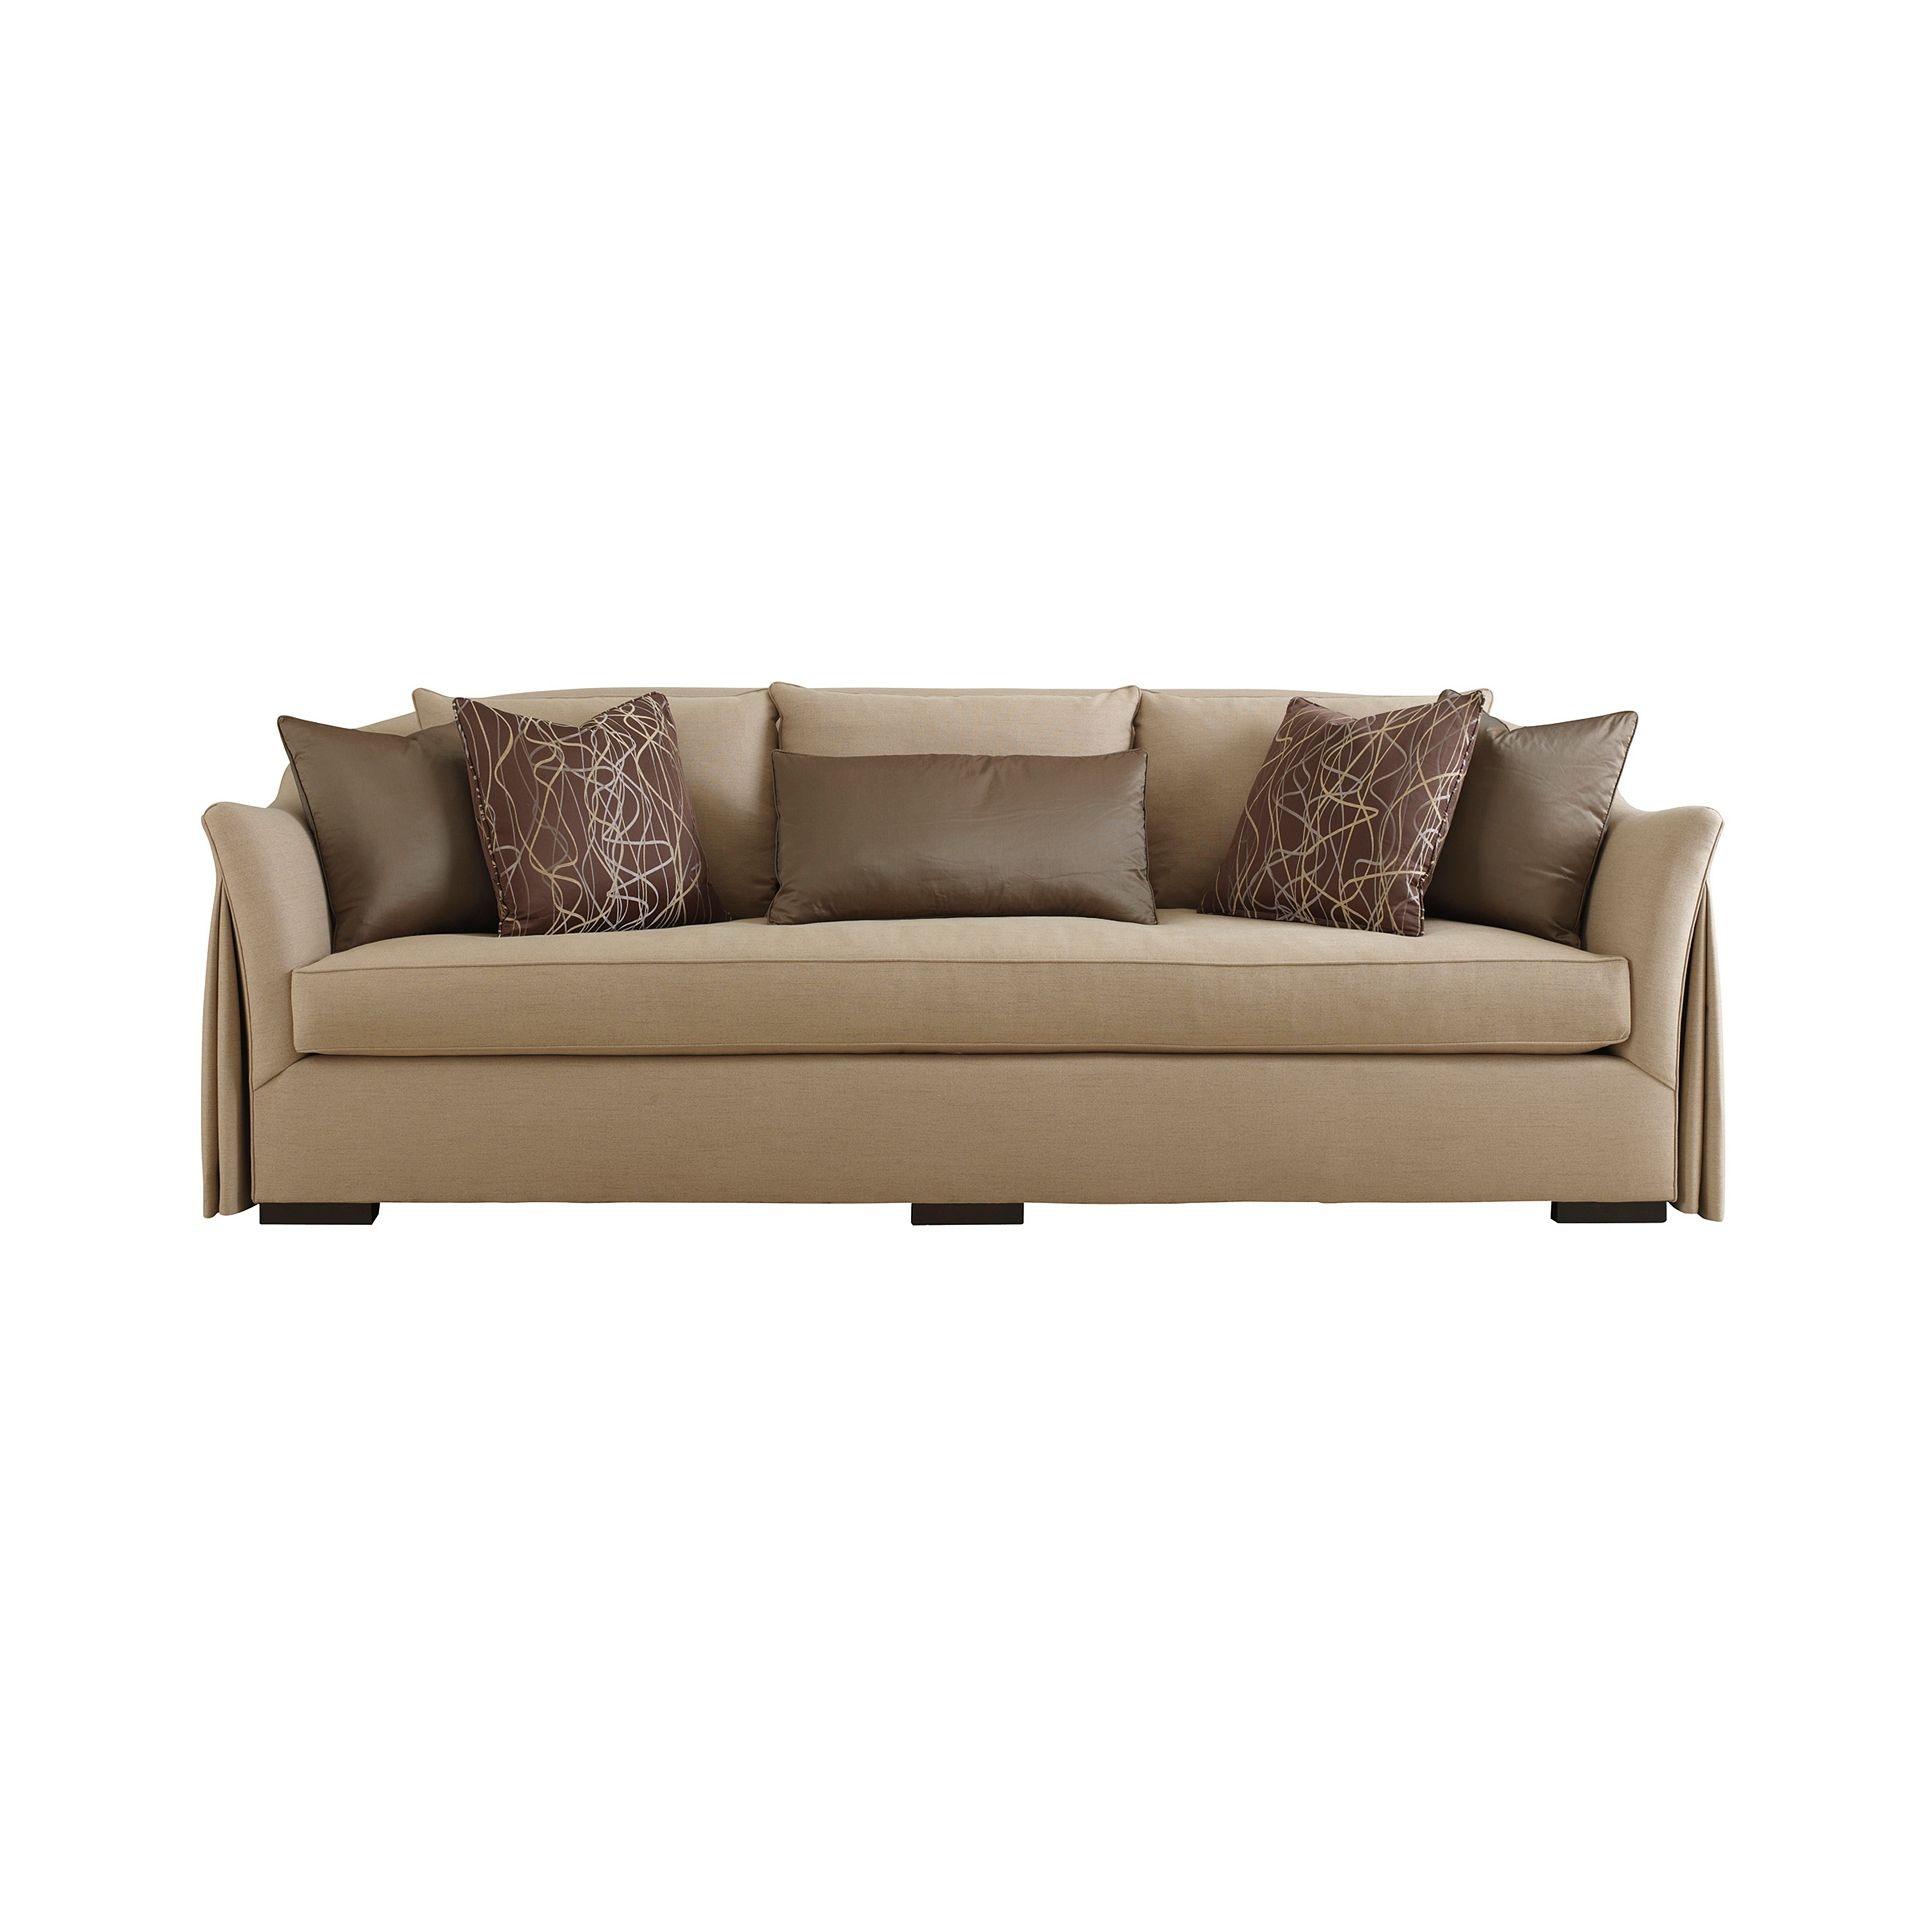 Etonnant Henredon Furniture H1102 C